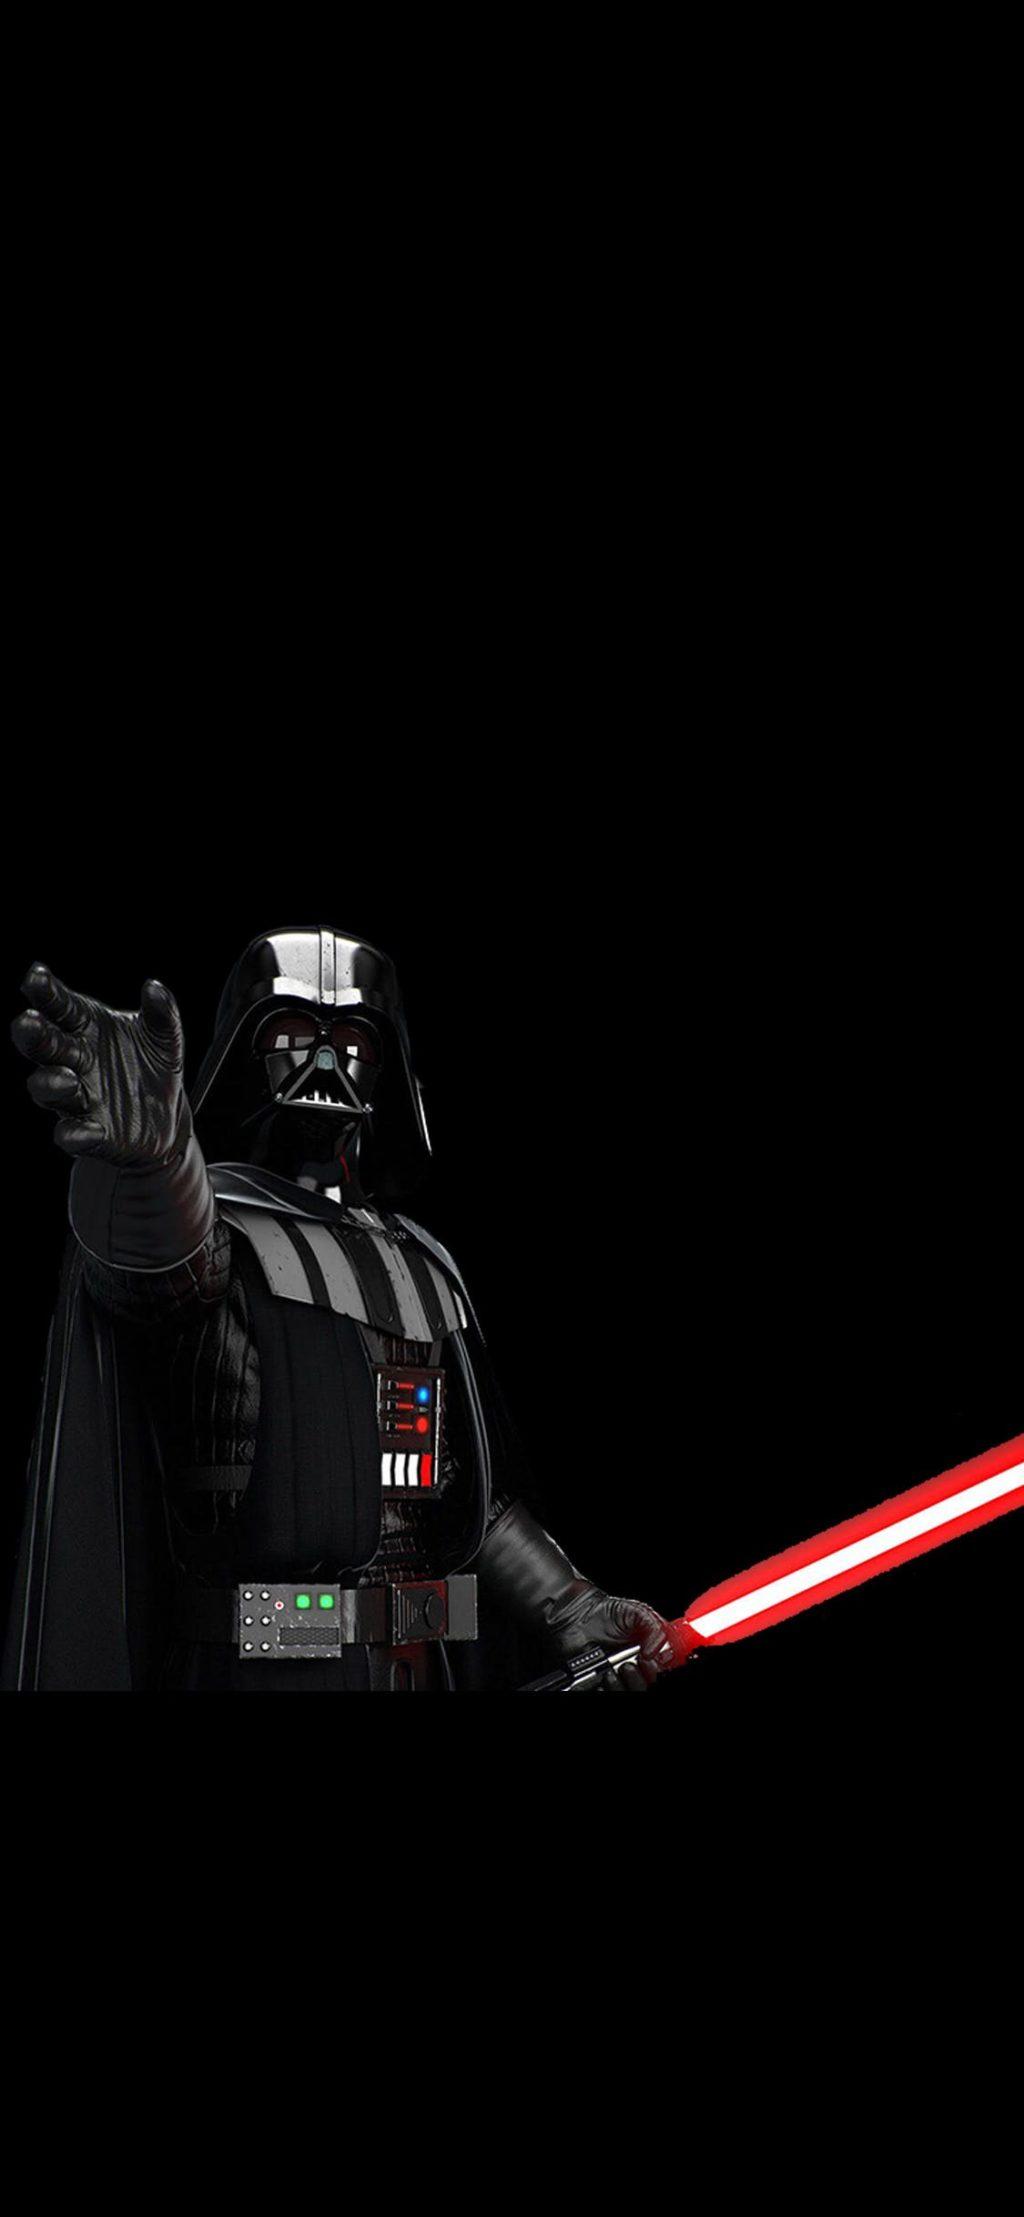 Darth Vader Iphone 11 1024x2217 Download Hd Wallpaper Wallpapertip